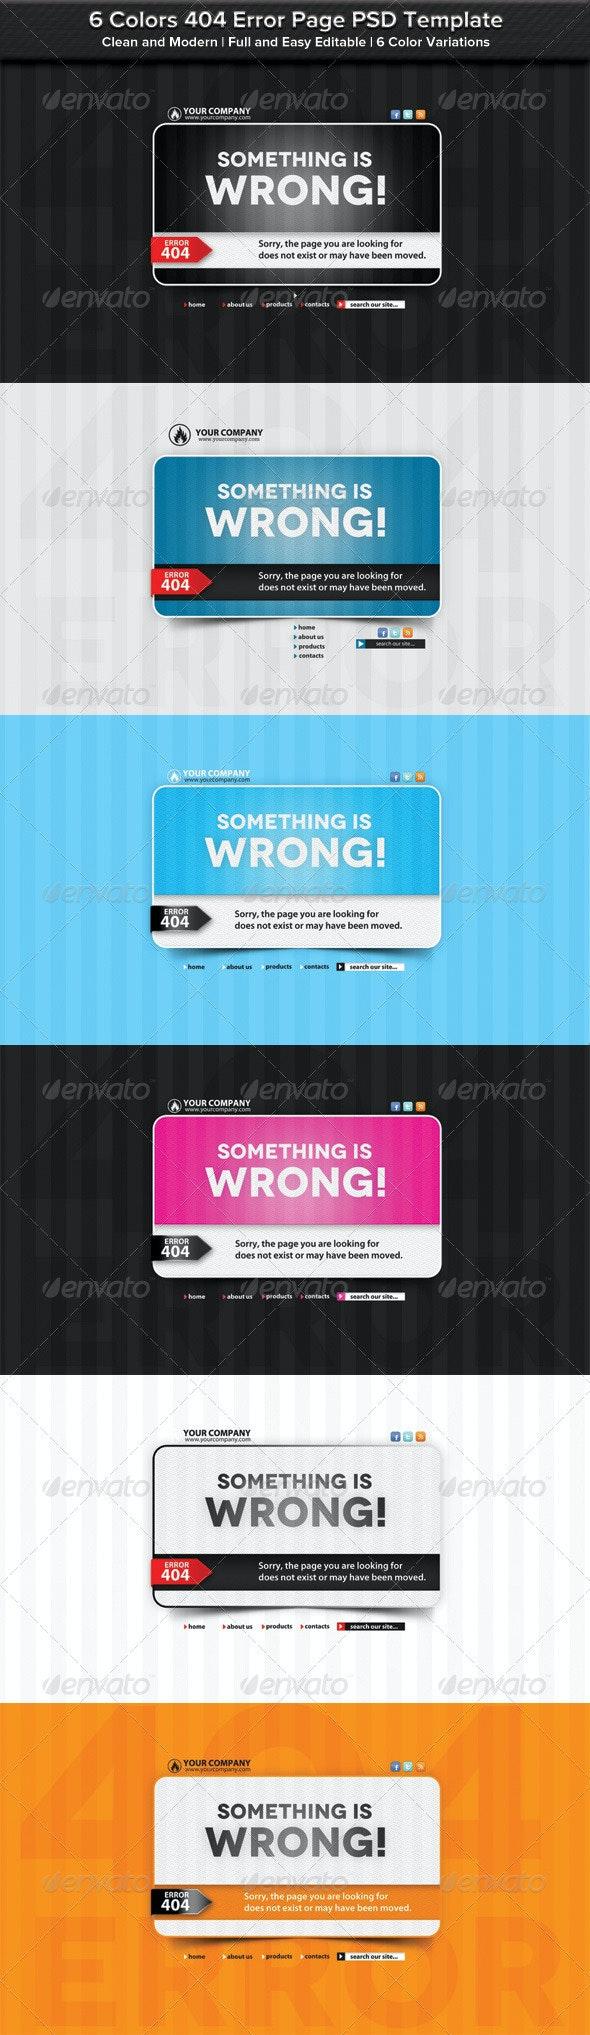 6 Colors 404 Error Page PSD Template - 404 Pages Web Elements